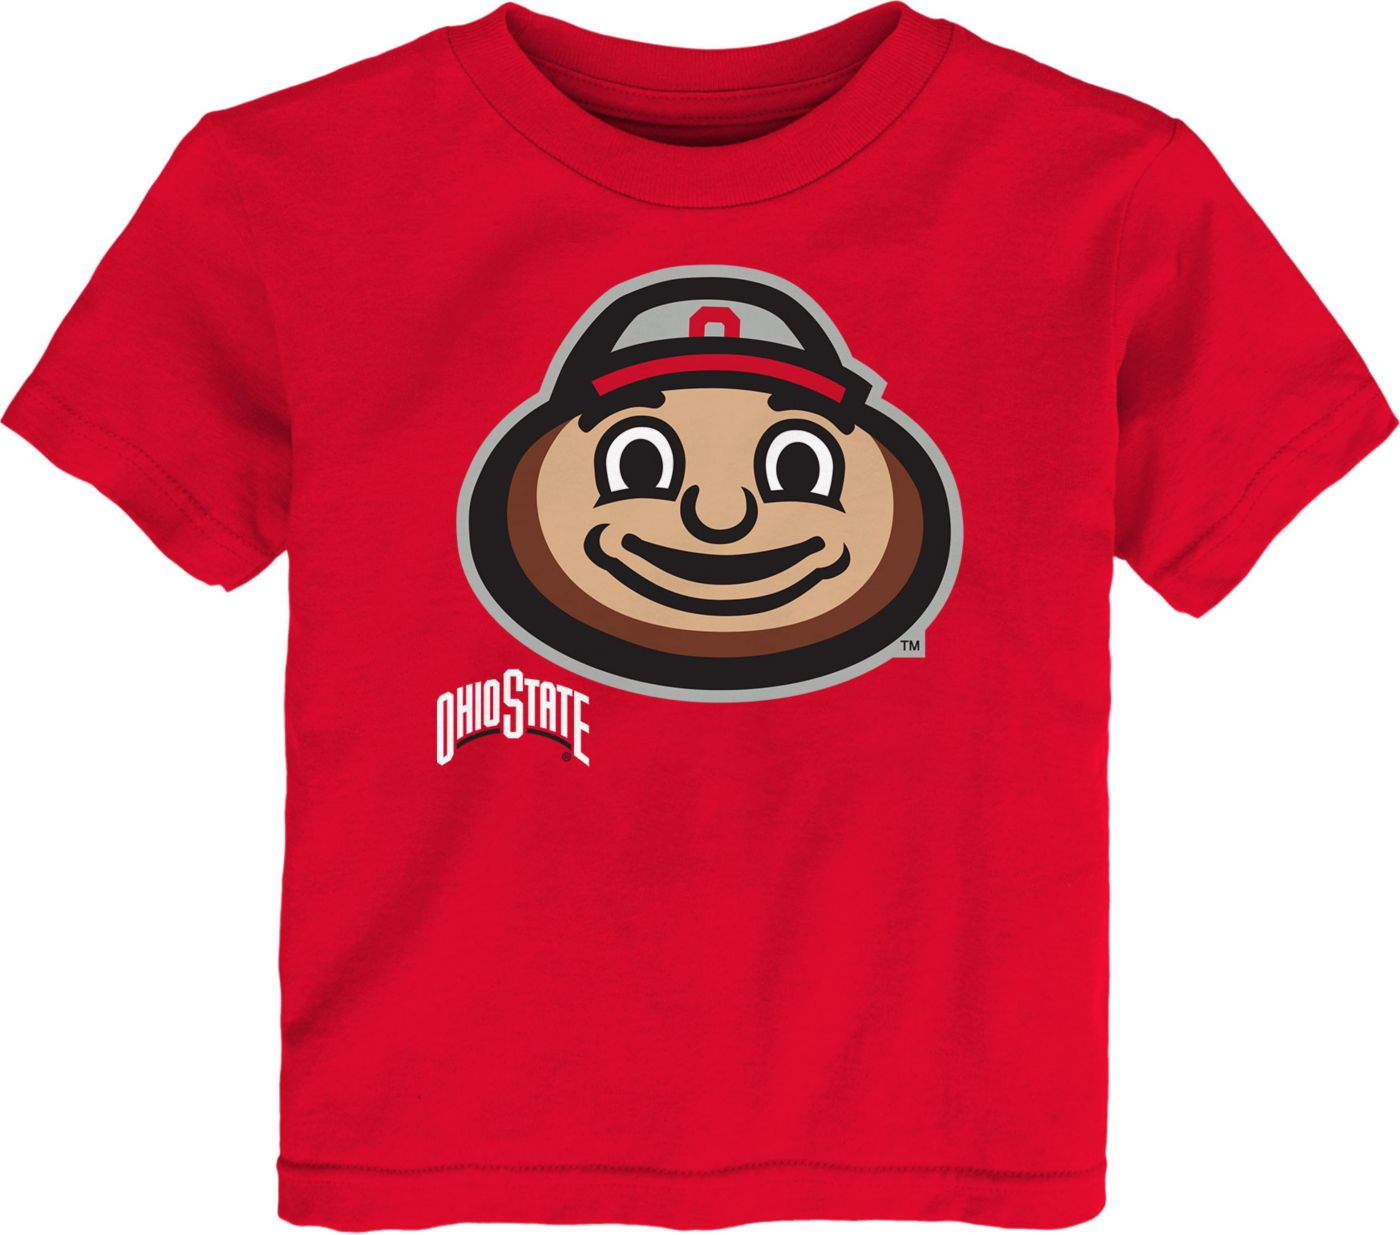 Gen2 Toddler Ohio State Buckeyes Scarlet Headshot T-Shirt